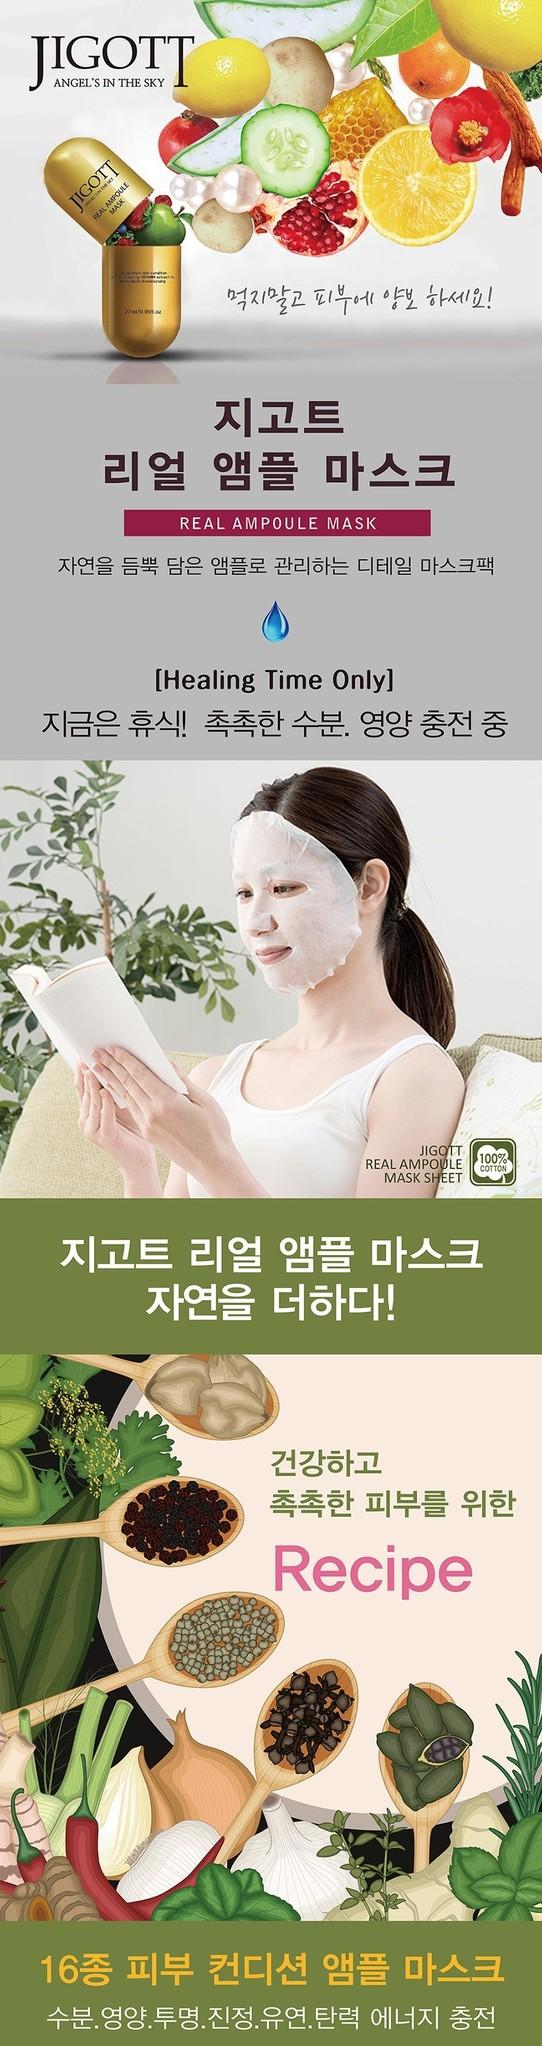 Real Ampoule Mask Probierset (2 Stk)-2